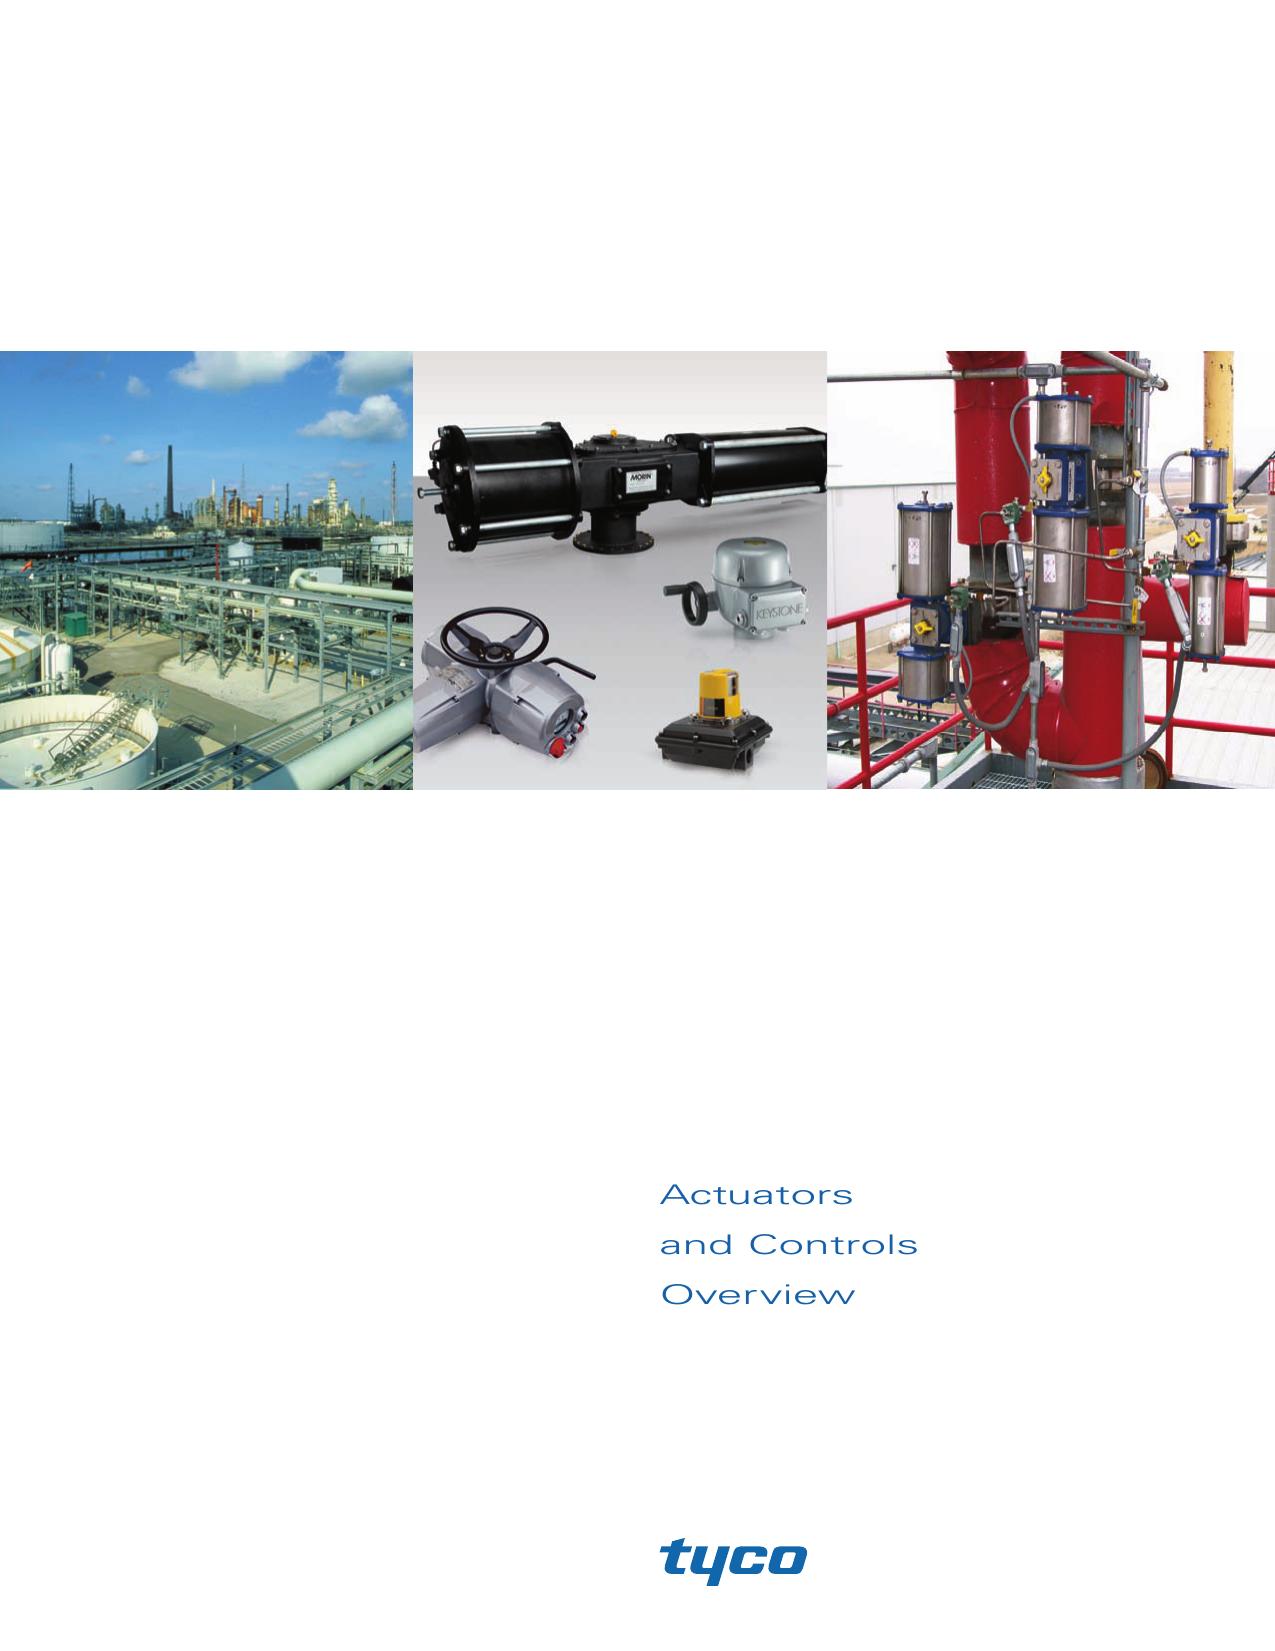 Actuators and Controls Overview | manualzz com